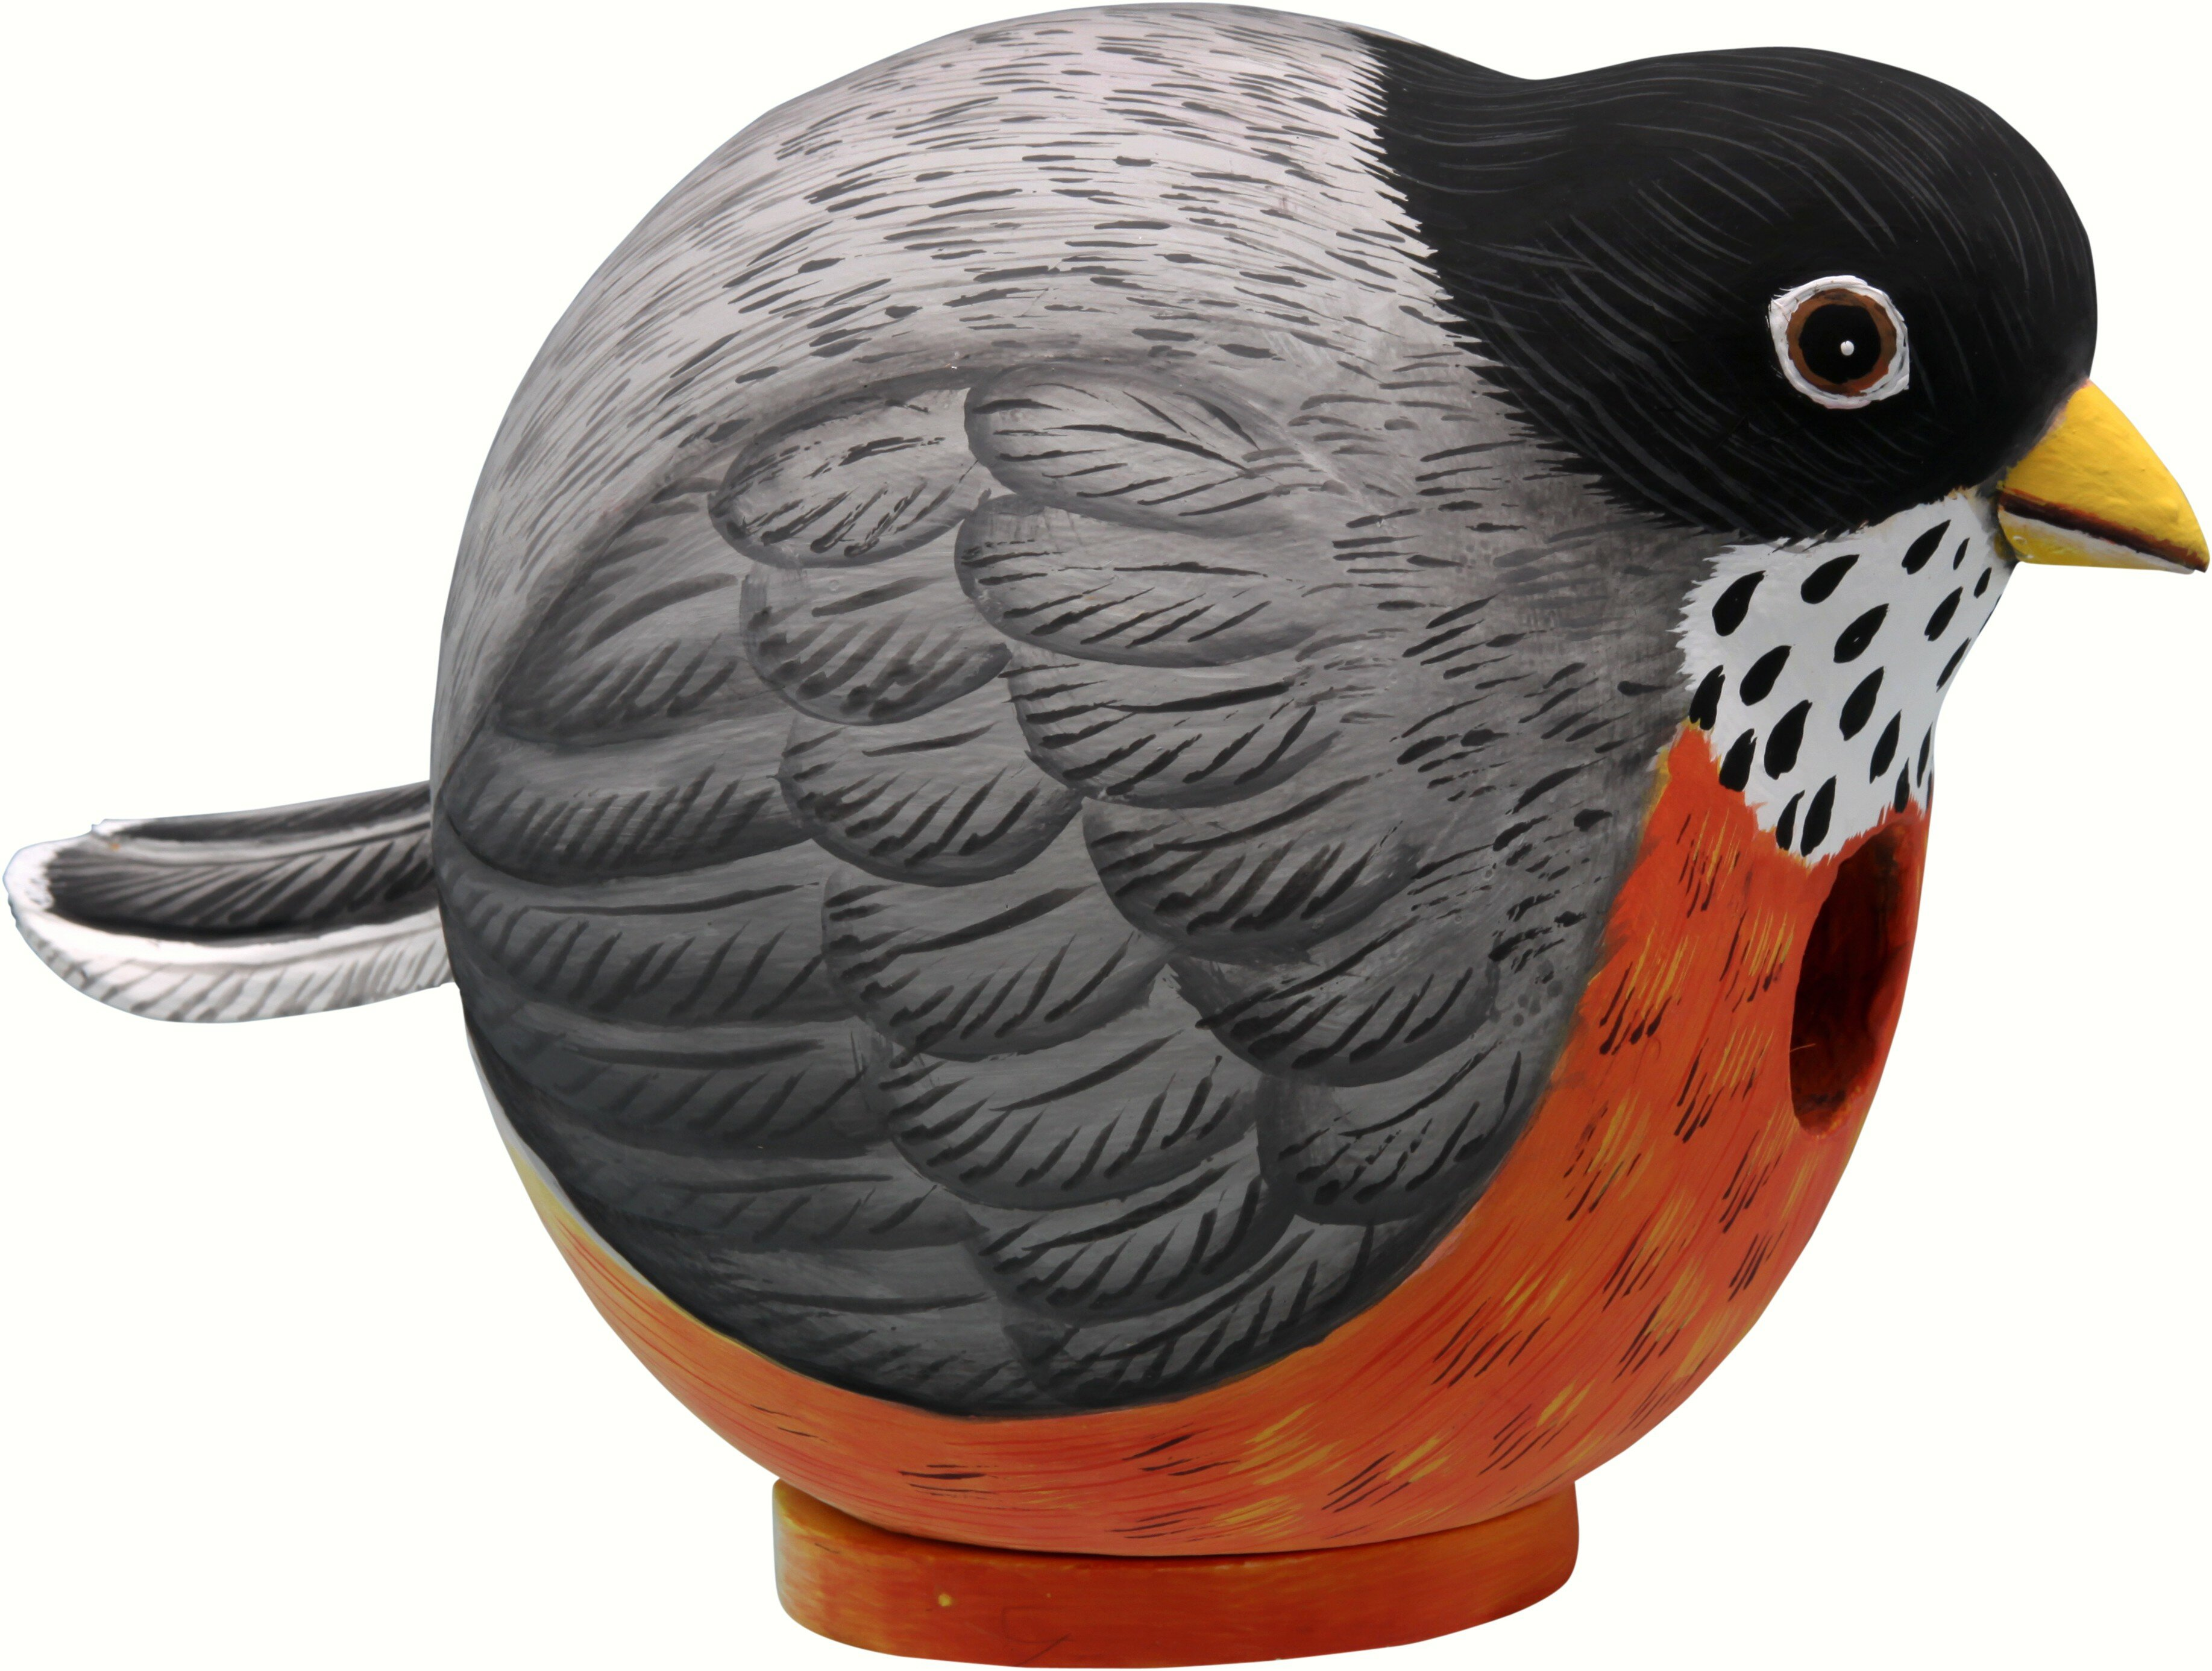 Songbird Essentials Robin Gord O 6 In X 6 In X 9 In Birdhouse Wayfair